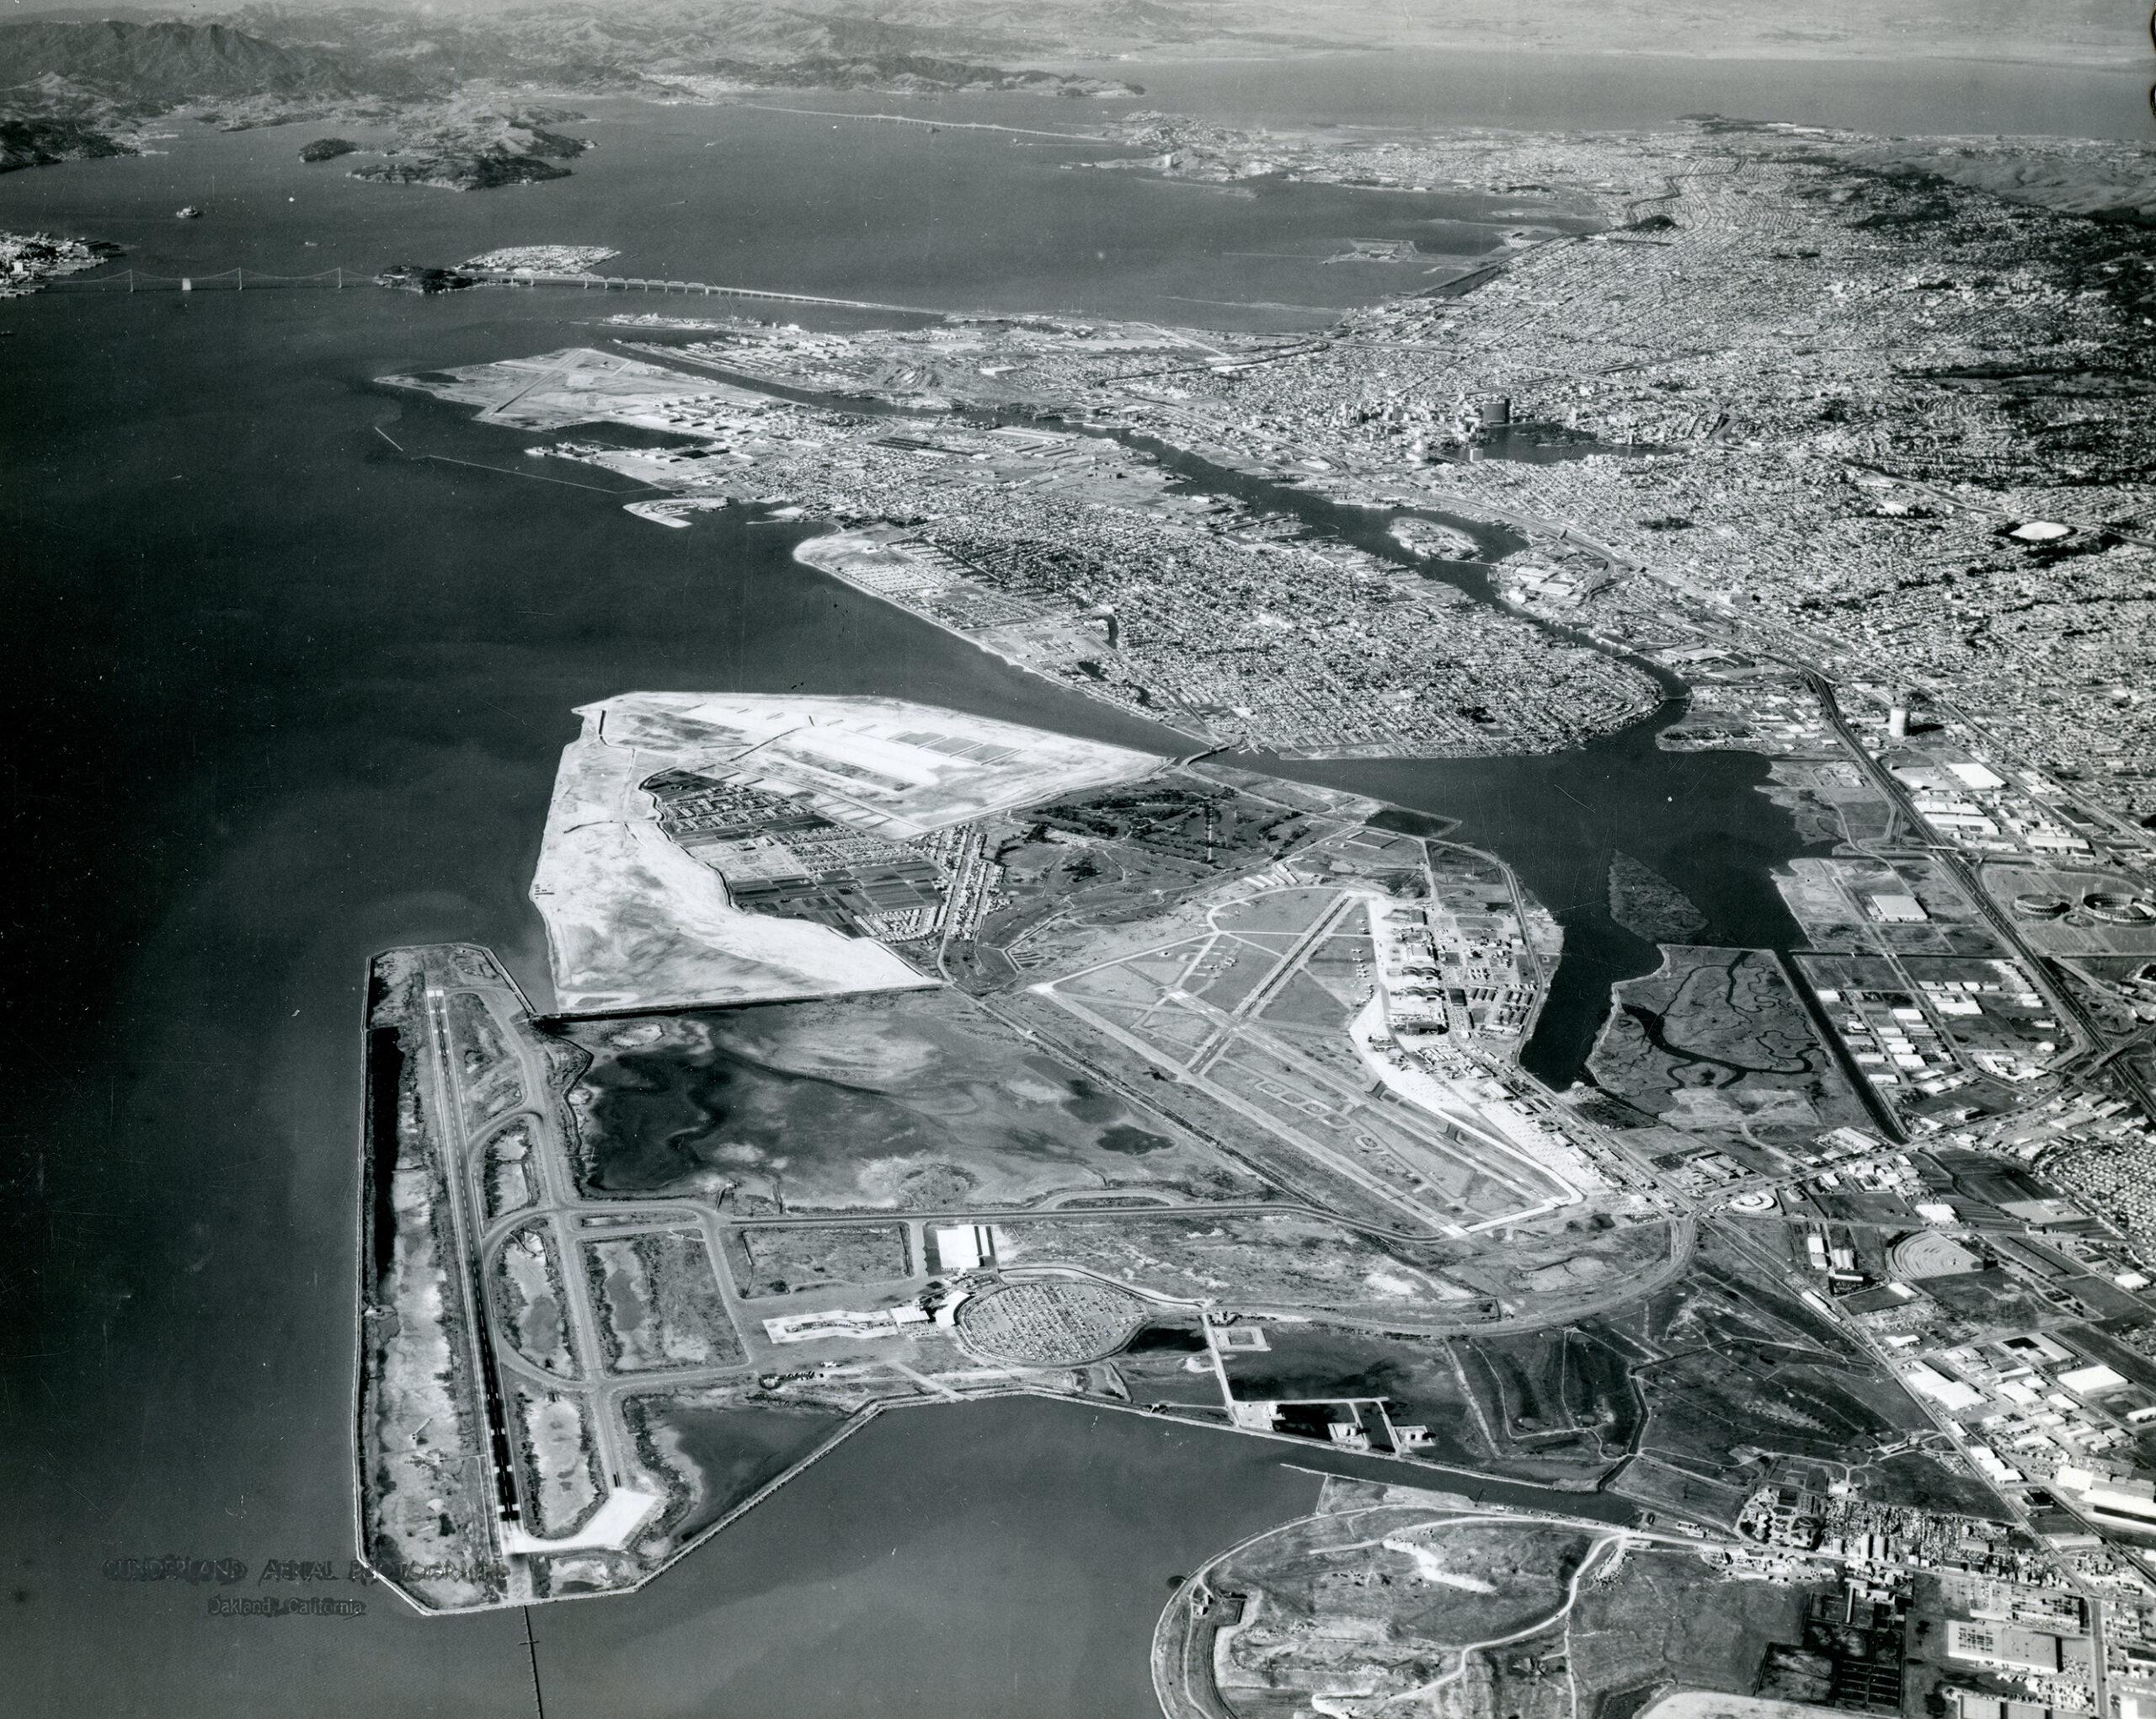 Alameda, Bay Farm Island, Oakland Airport, Dec. 26, 1969